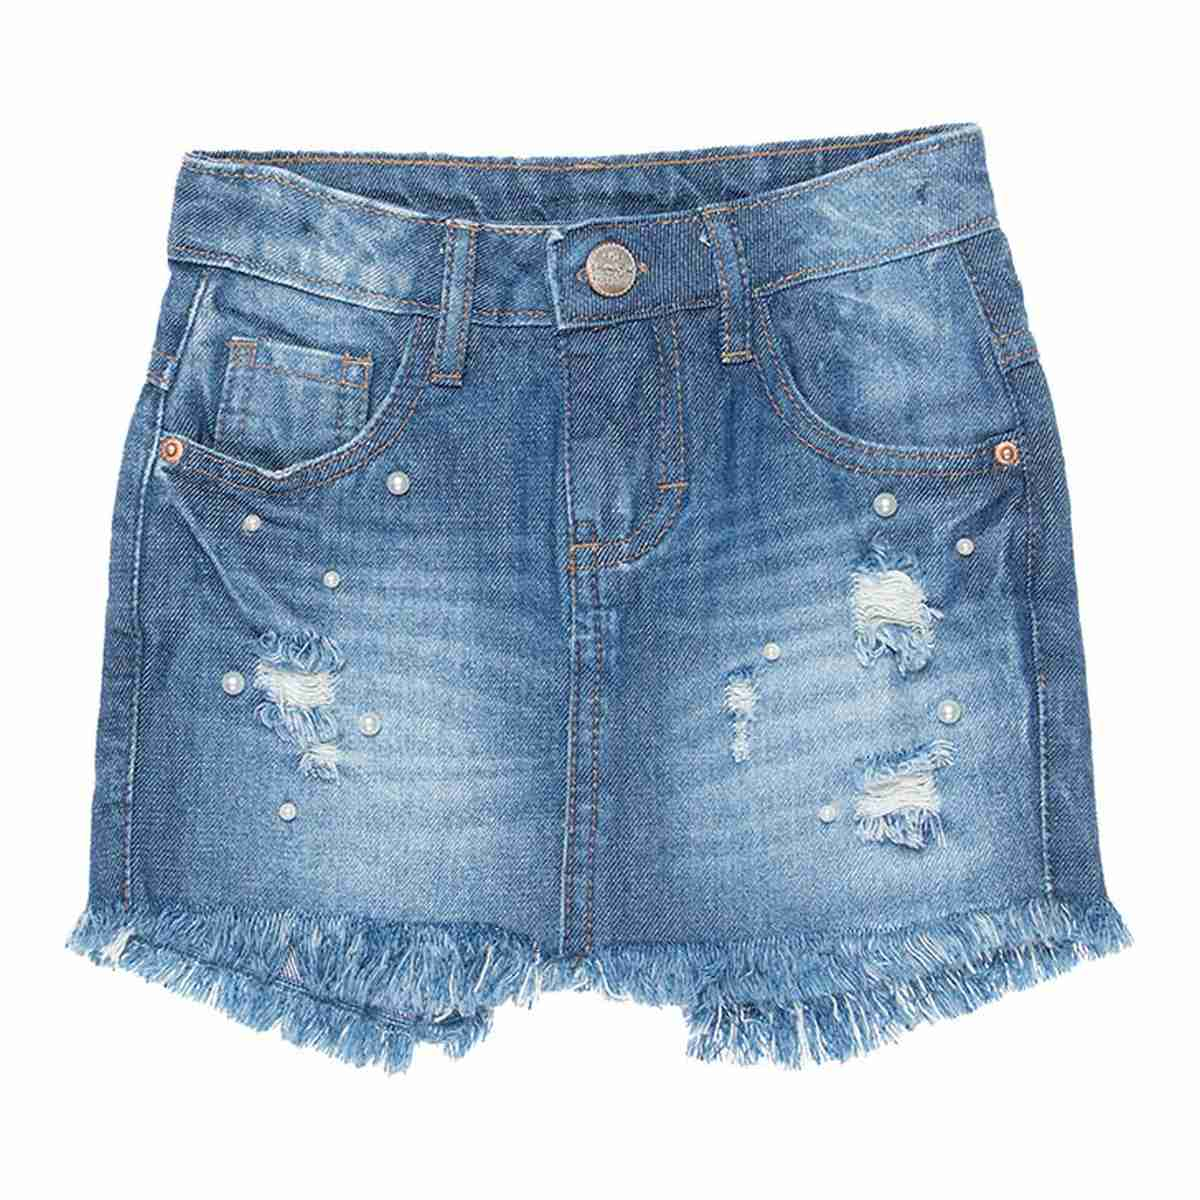 Short Saia Jeans Menina - Mania Kids